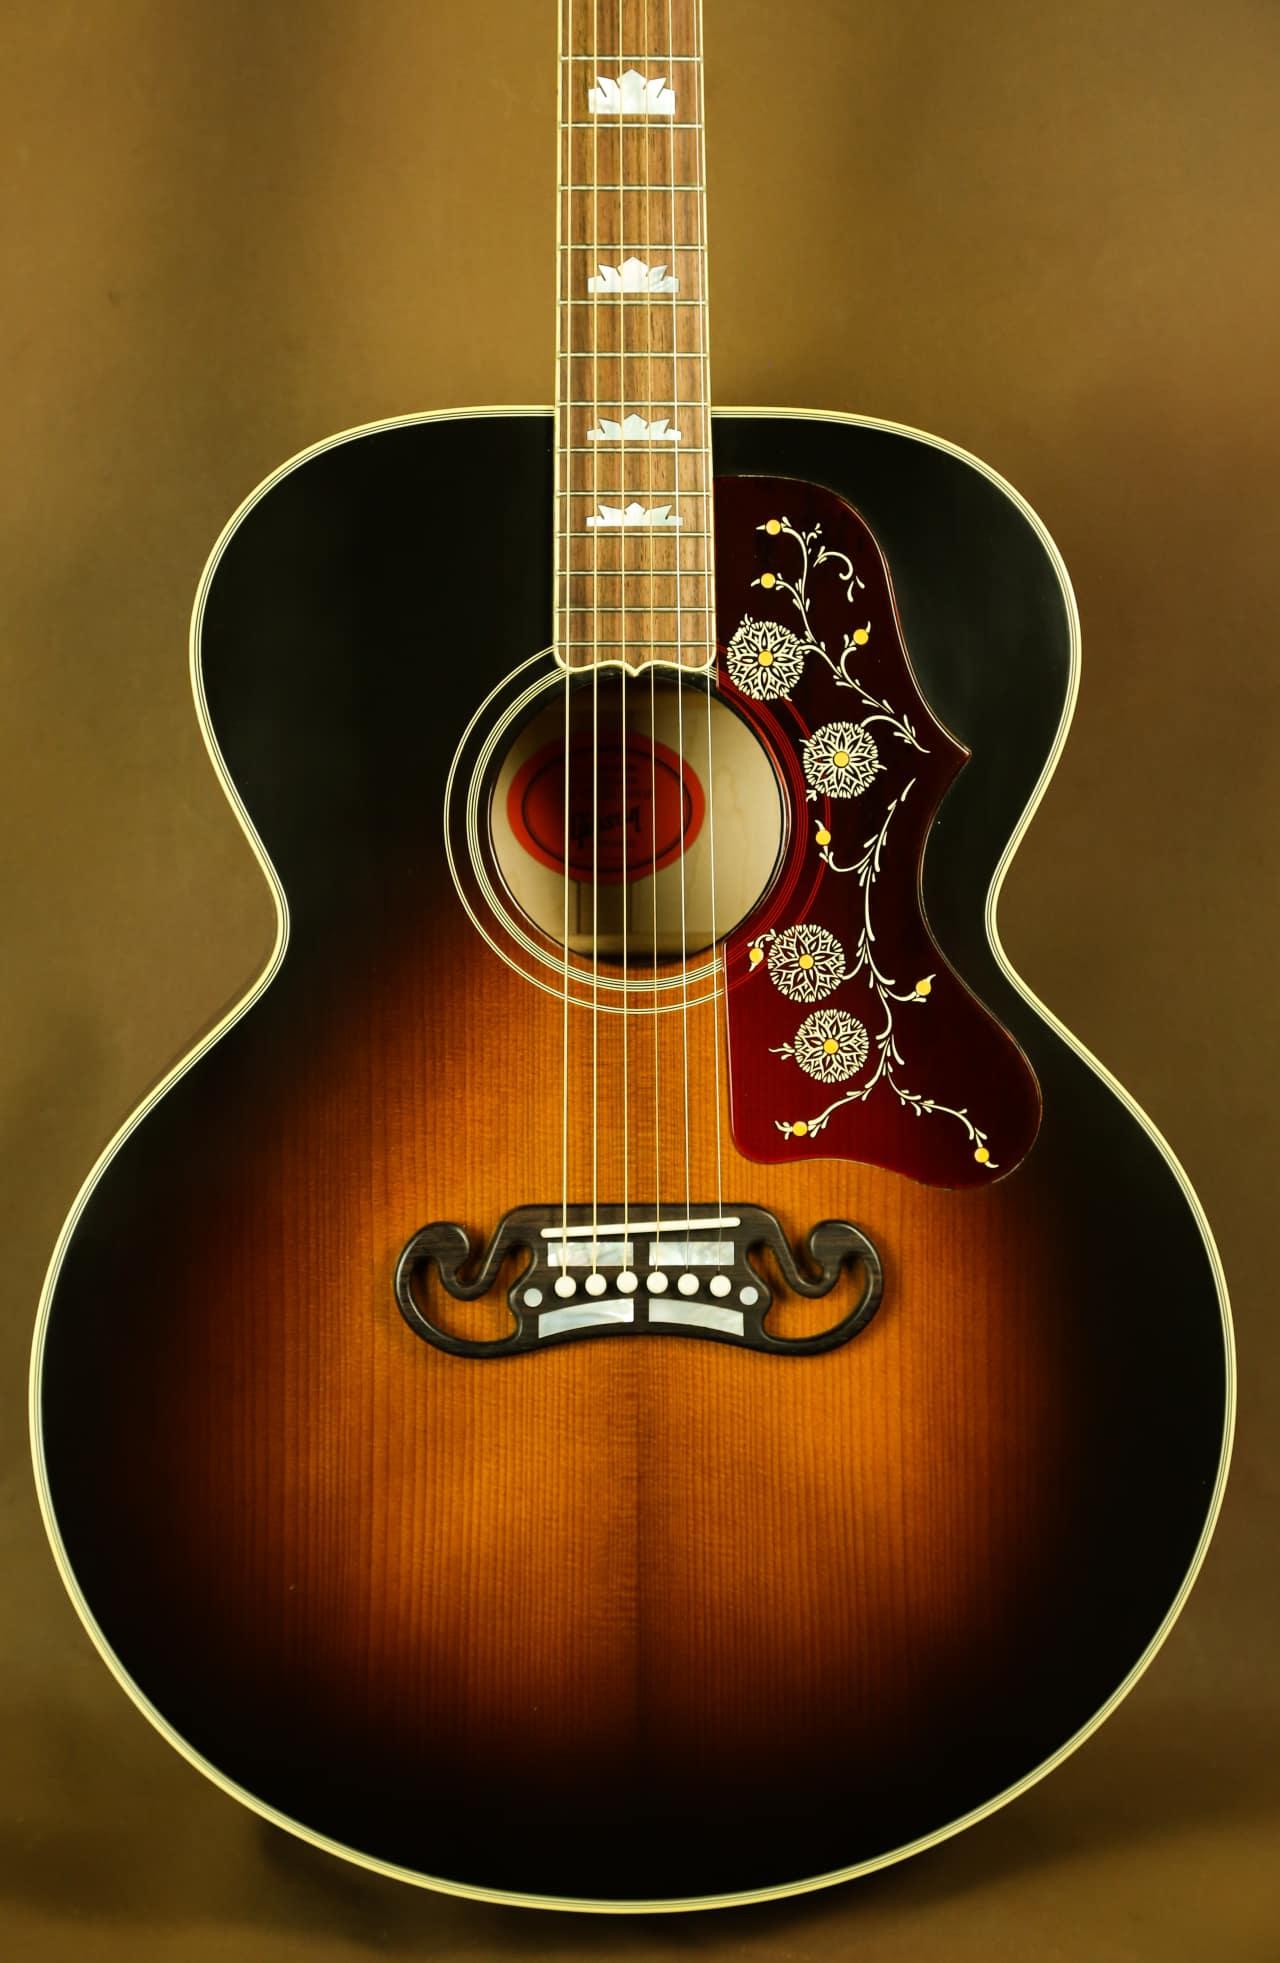 gibson 1957 sj 200 reissue adirondack top acoustic guitar reverb. Black Bedroom Furniture Sets. Home Design Ideas